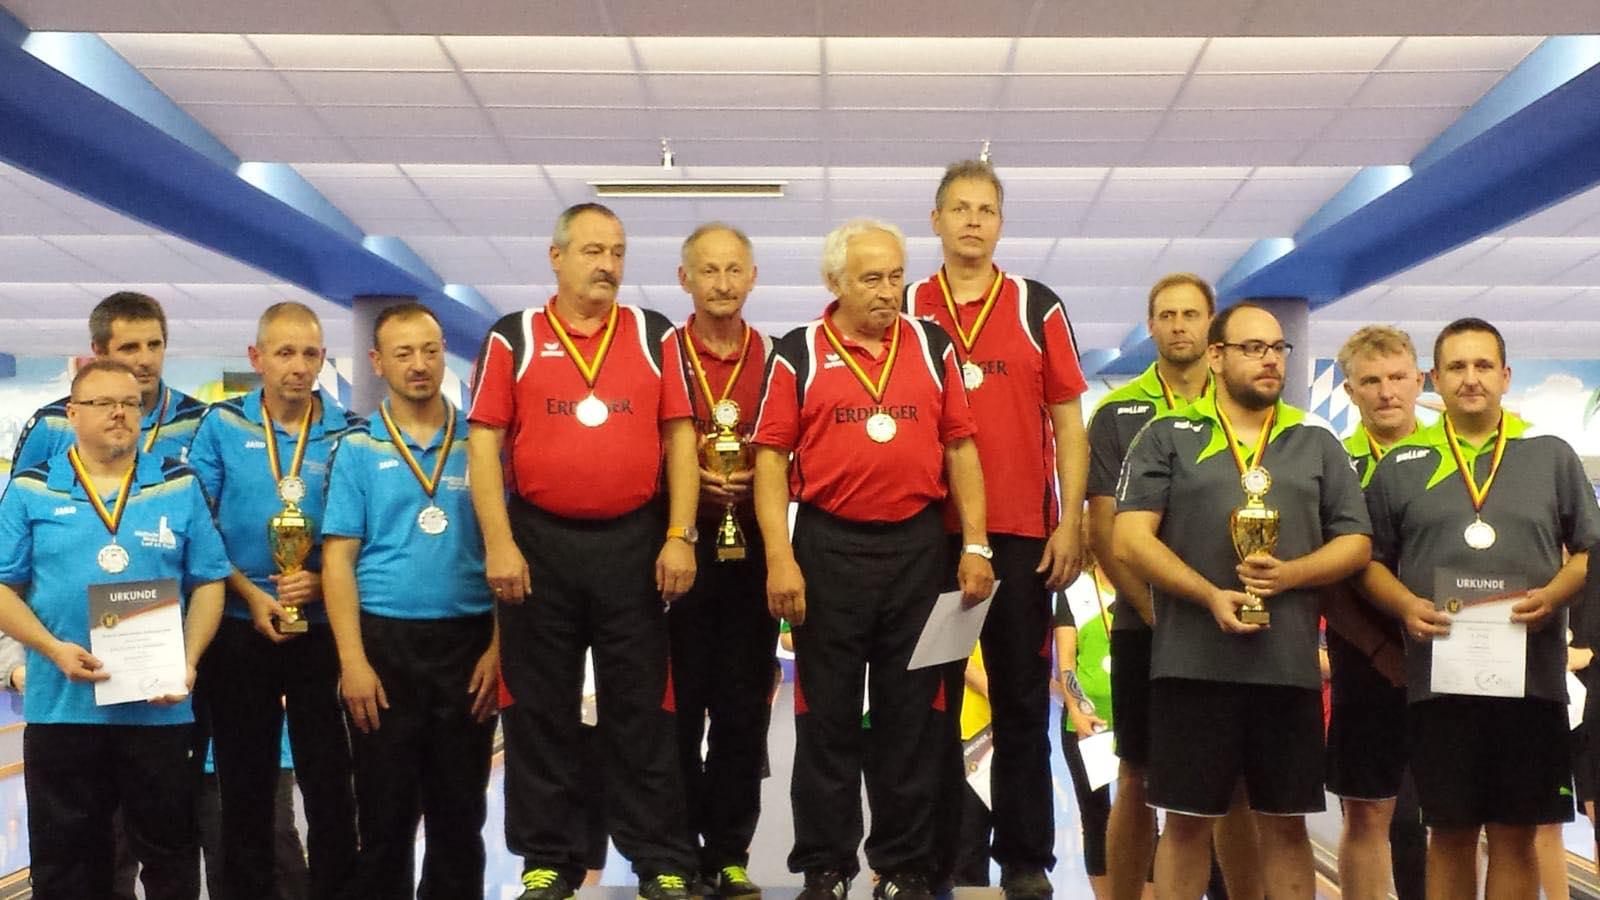 Siegerehrung Deutsche Meisterschaft im Kegeln 2018 - KC-Isen 1. Platz